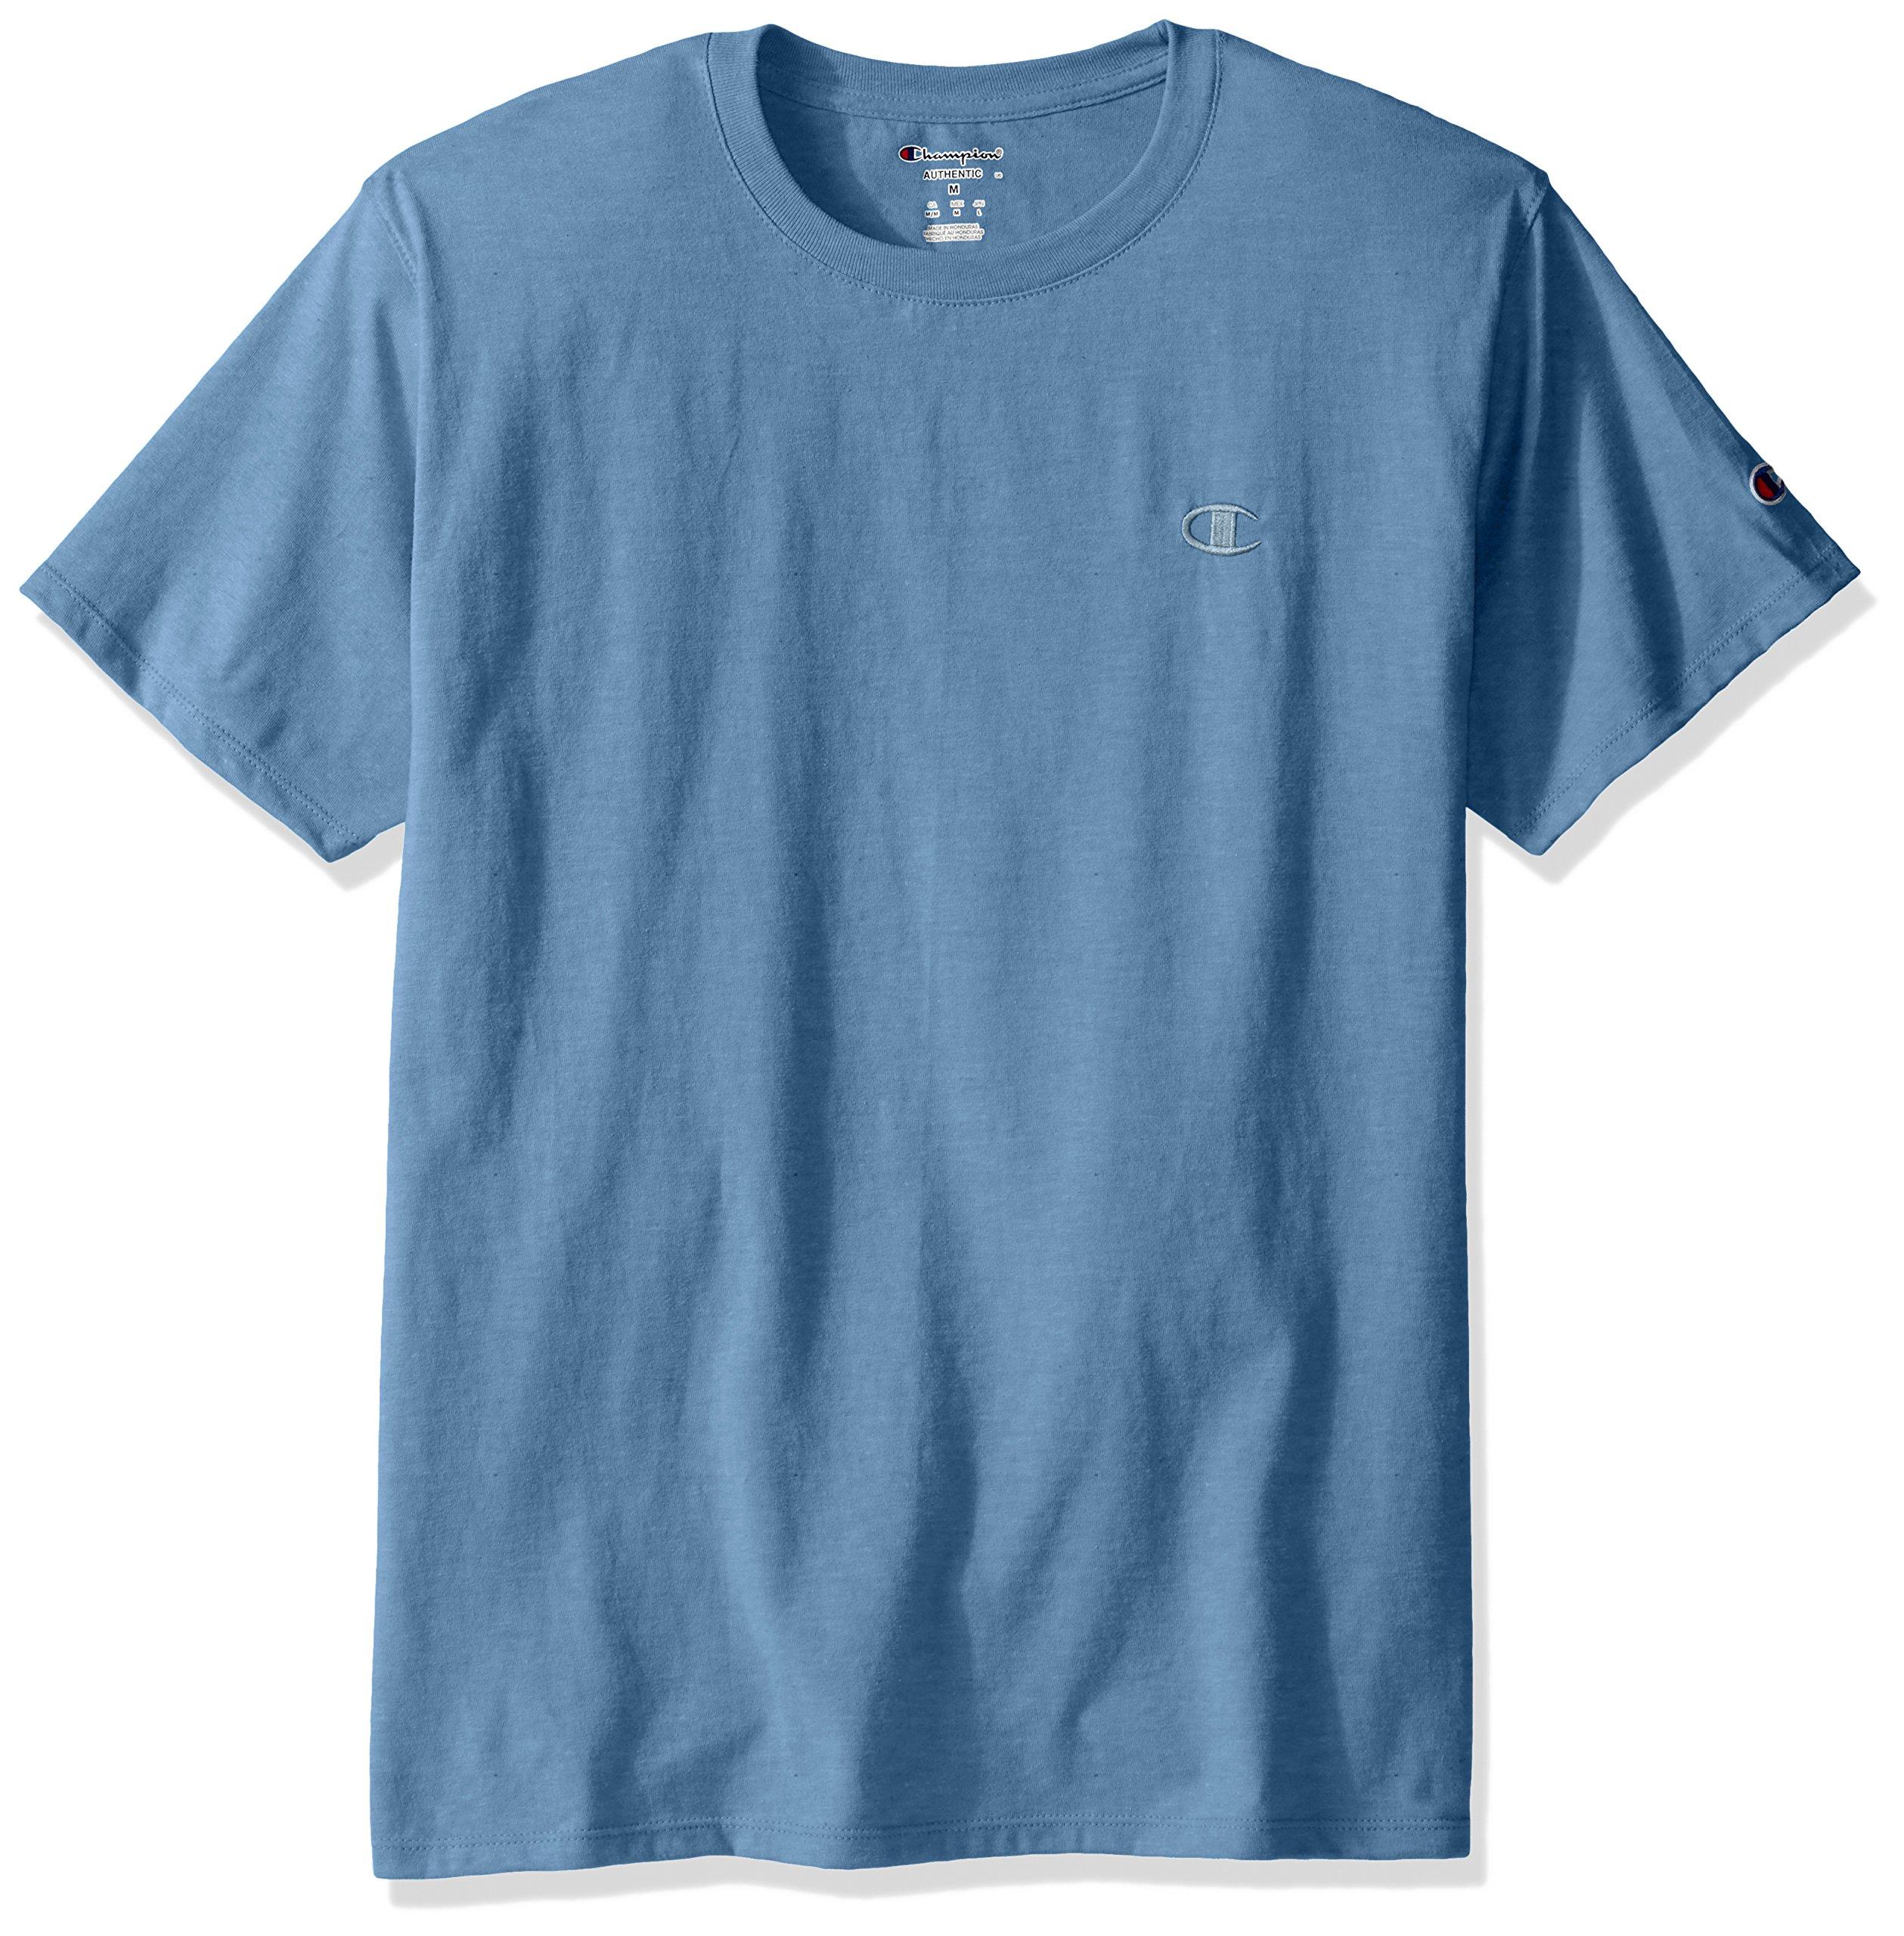 Champion Men's Classic Jersey T-Shirt, Swiss Blue, M by Champion